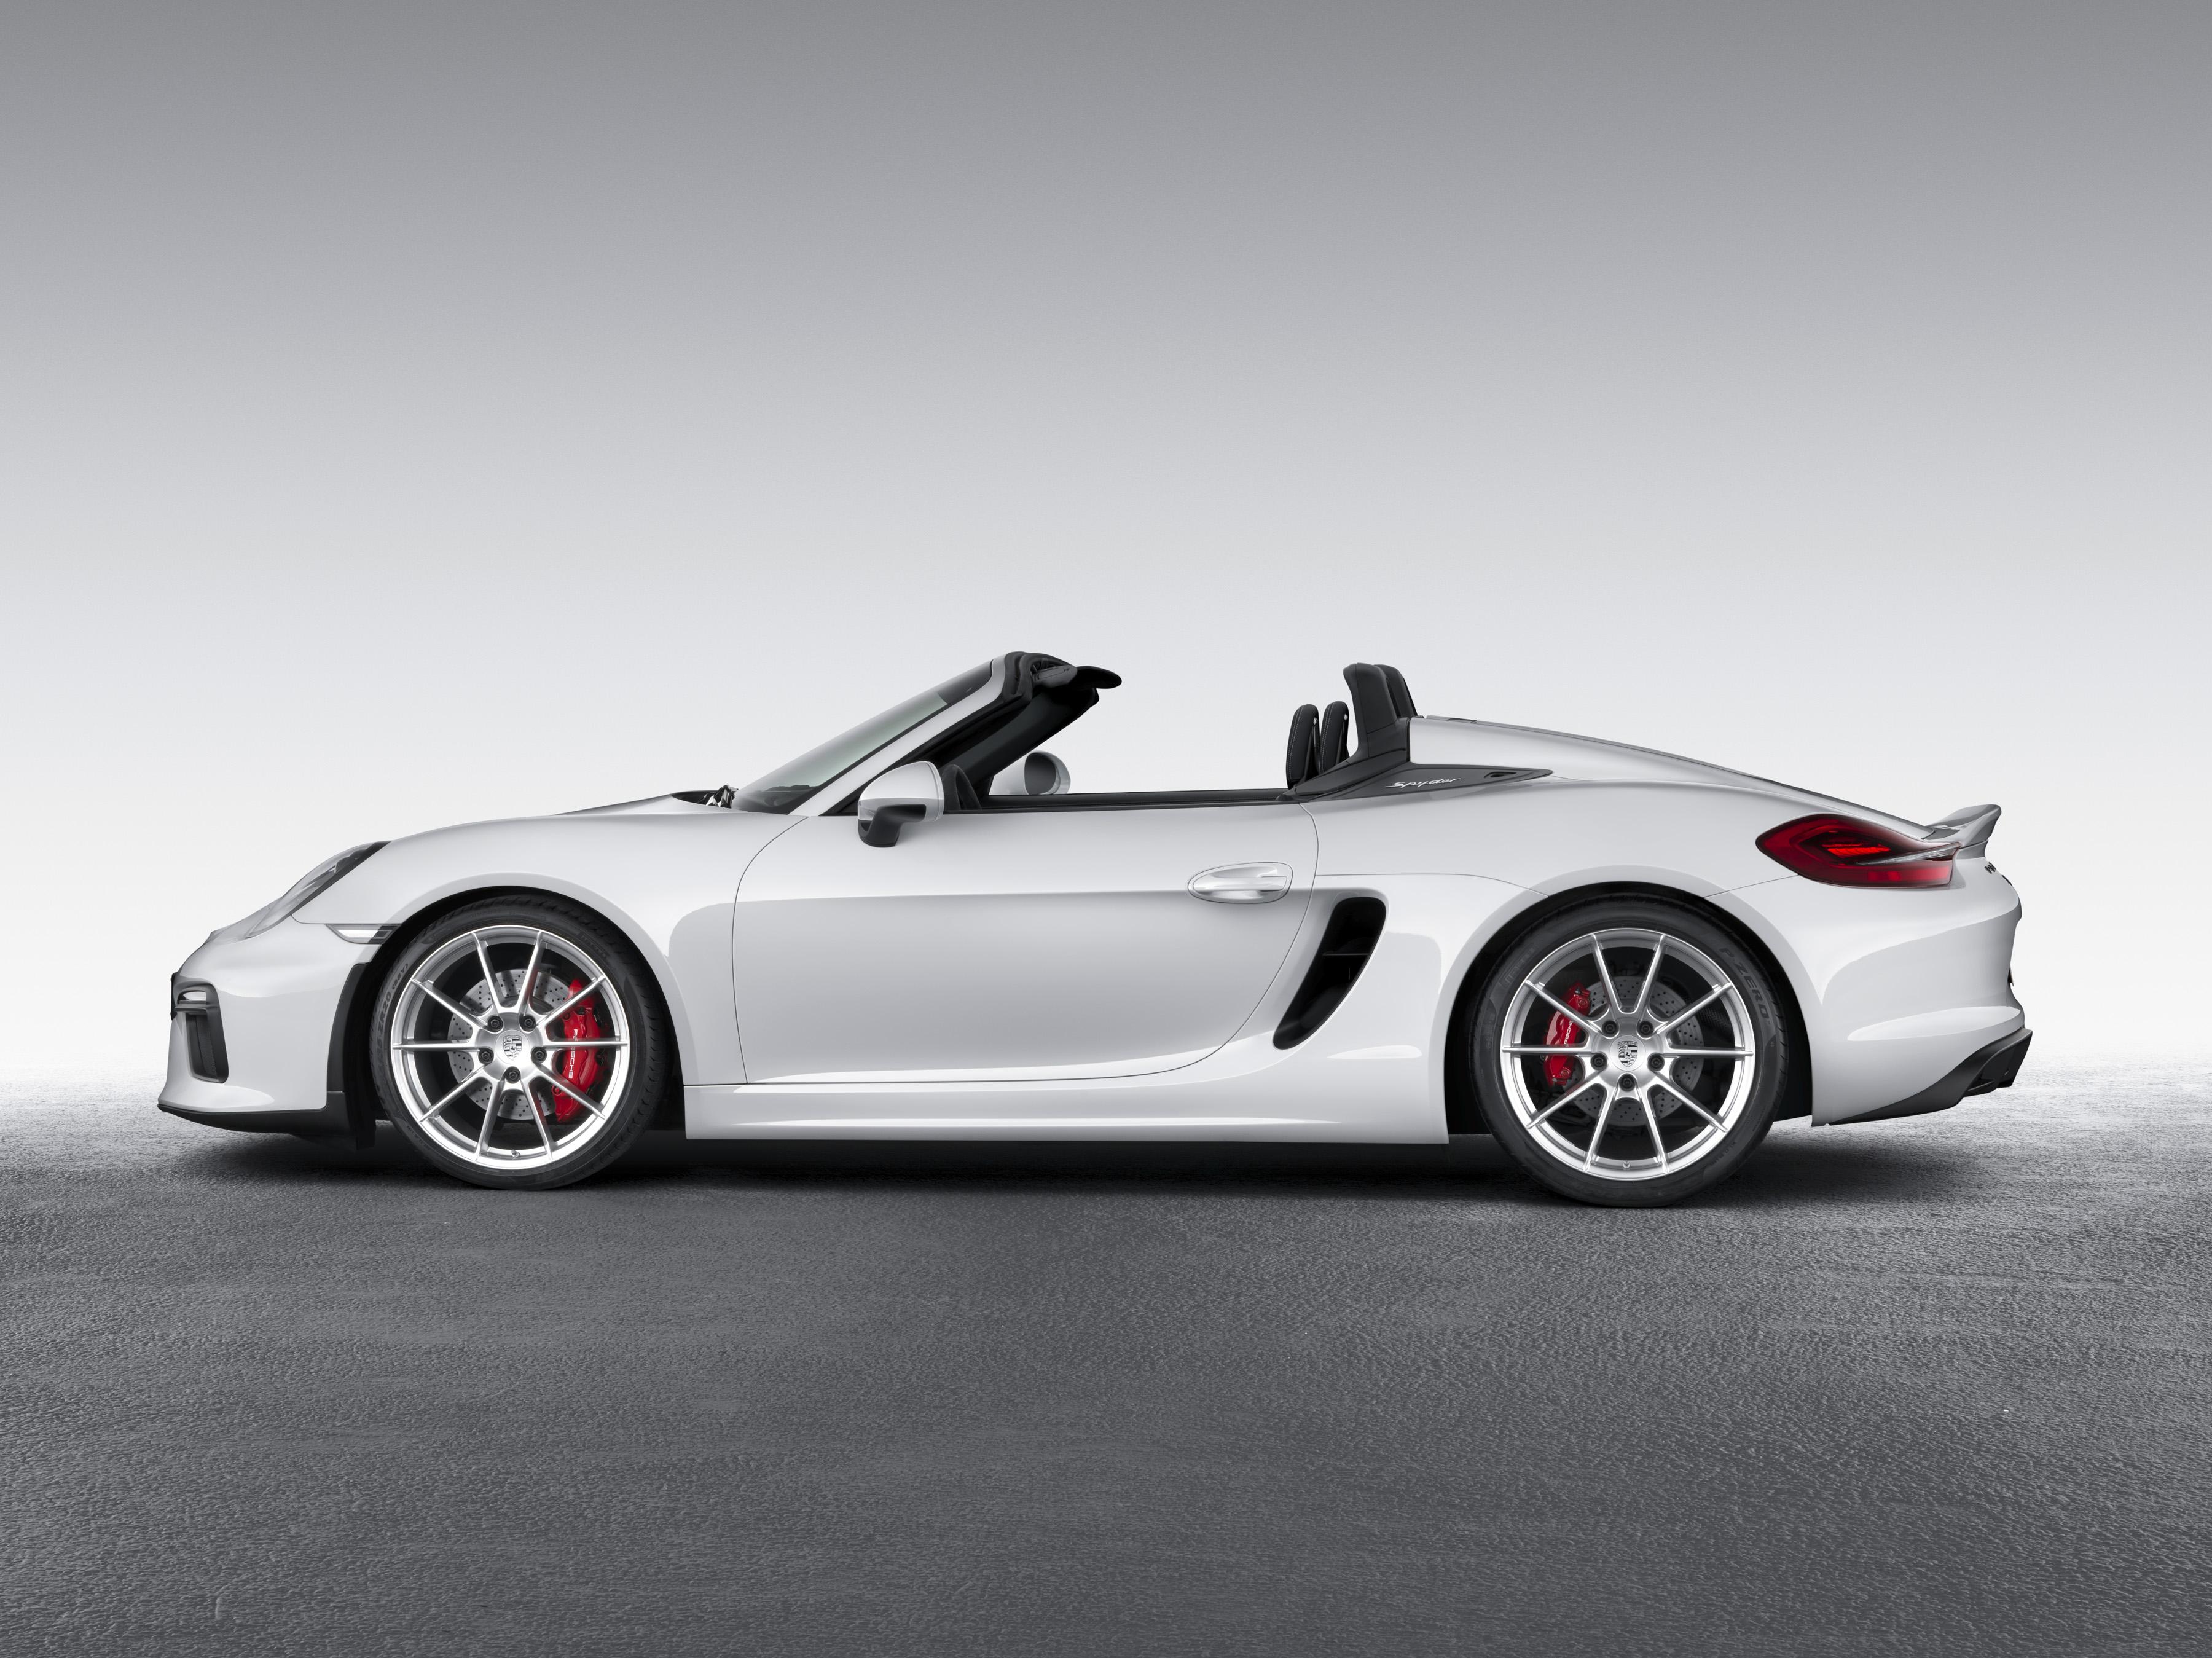 Porsche 2016 Boxster Spyder - profil / side face - open